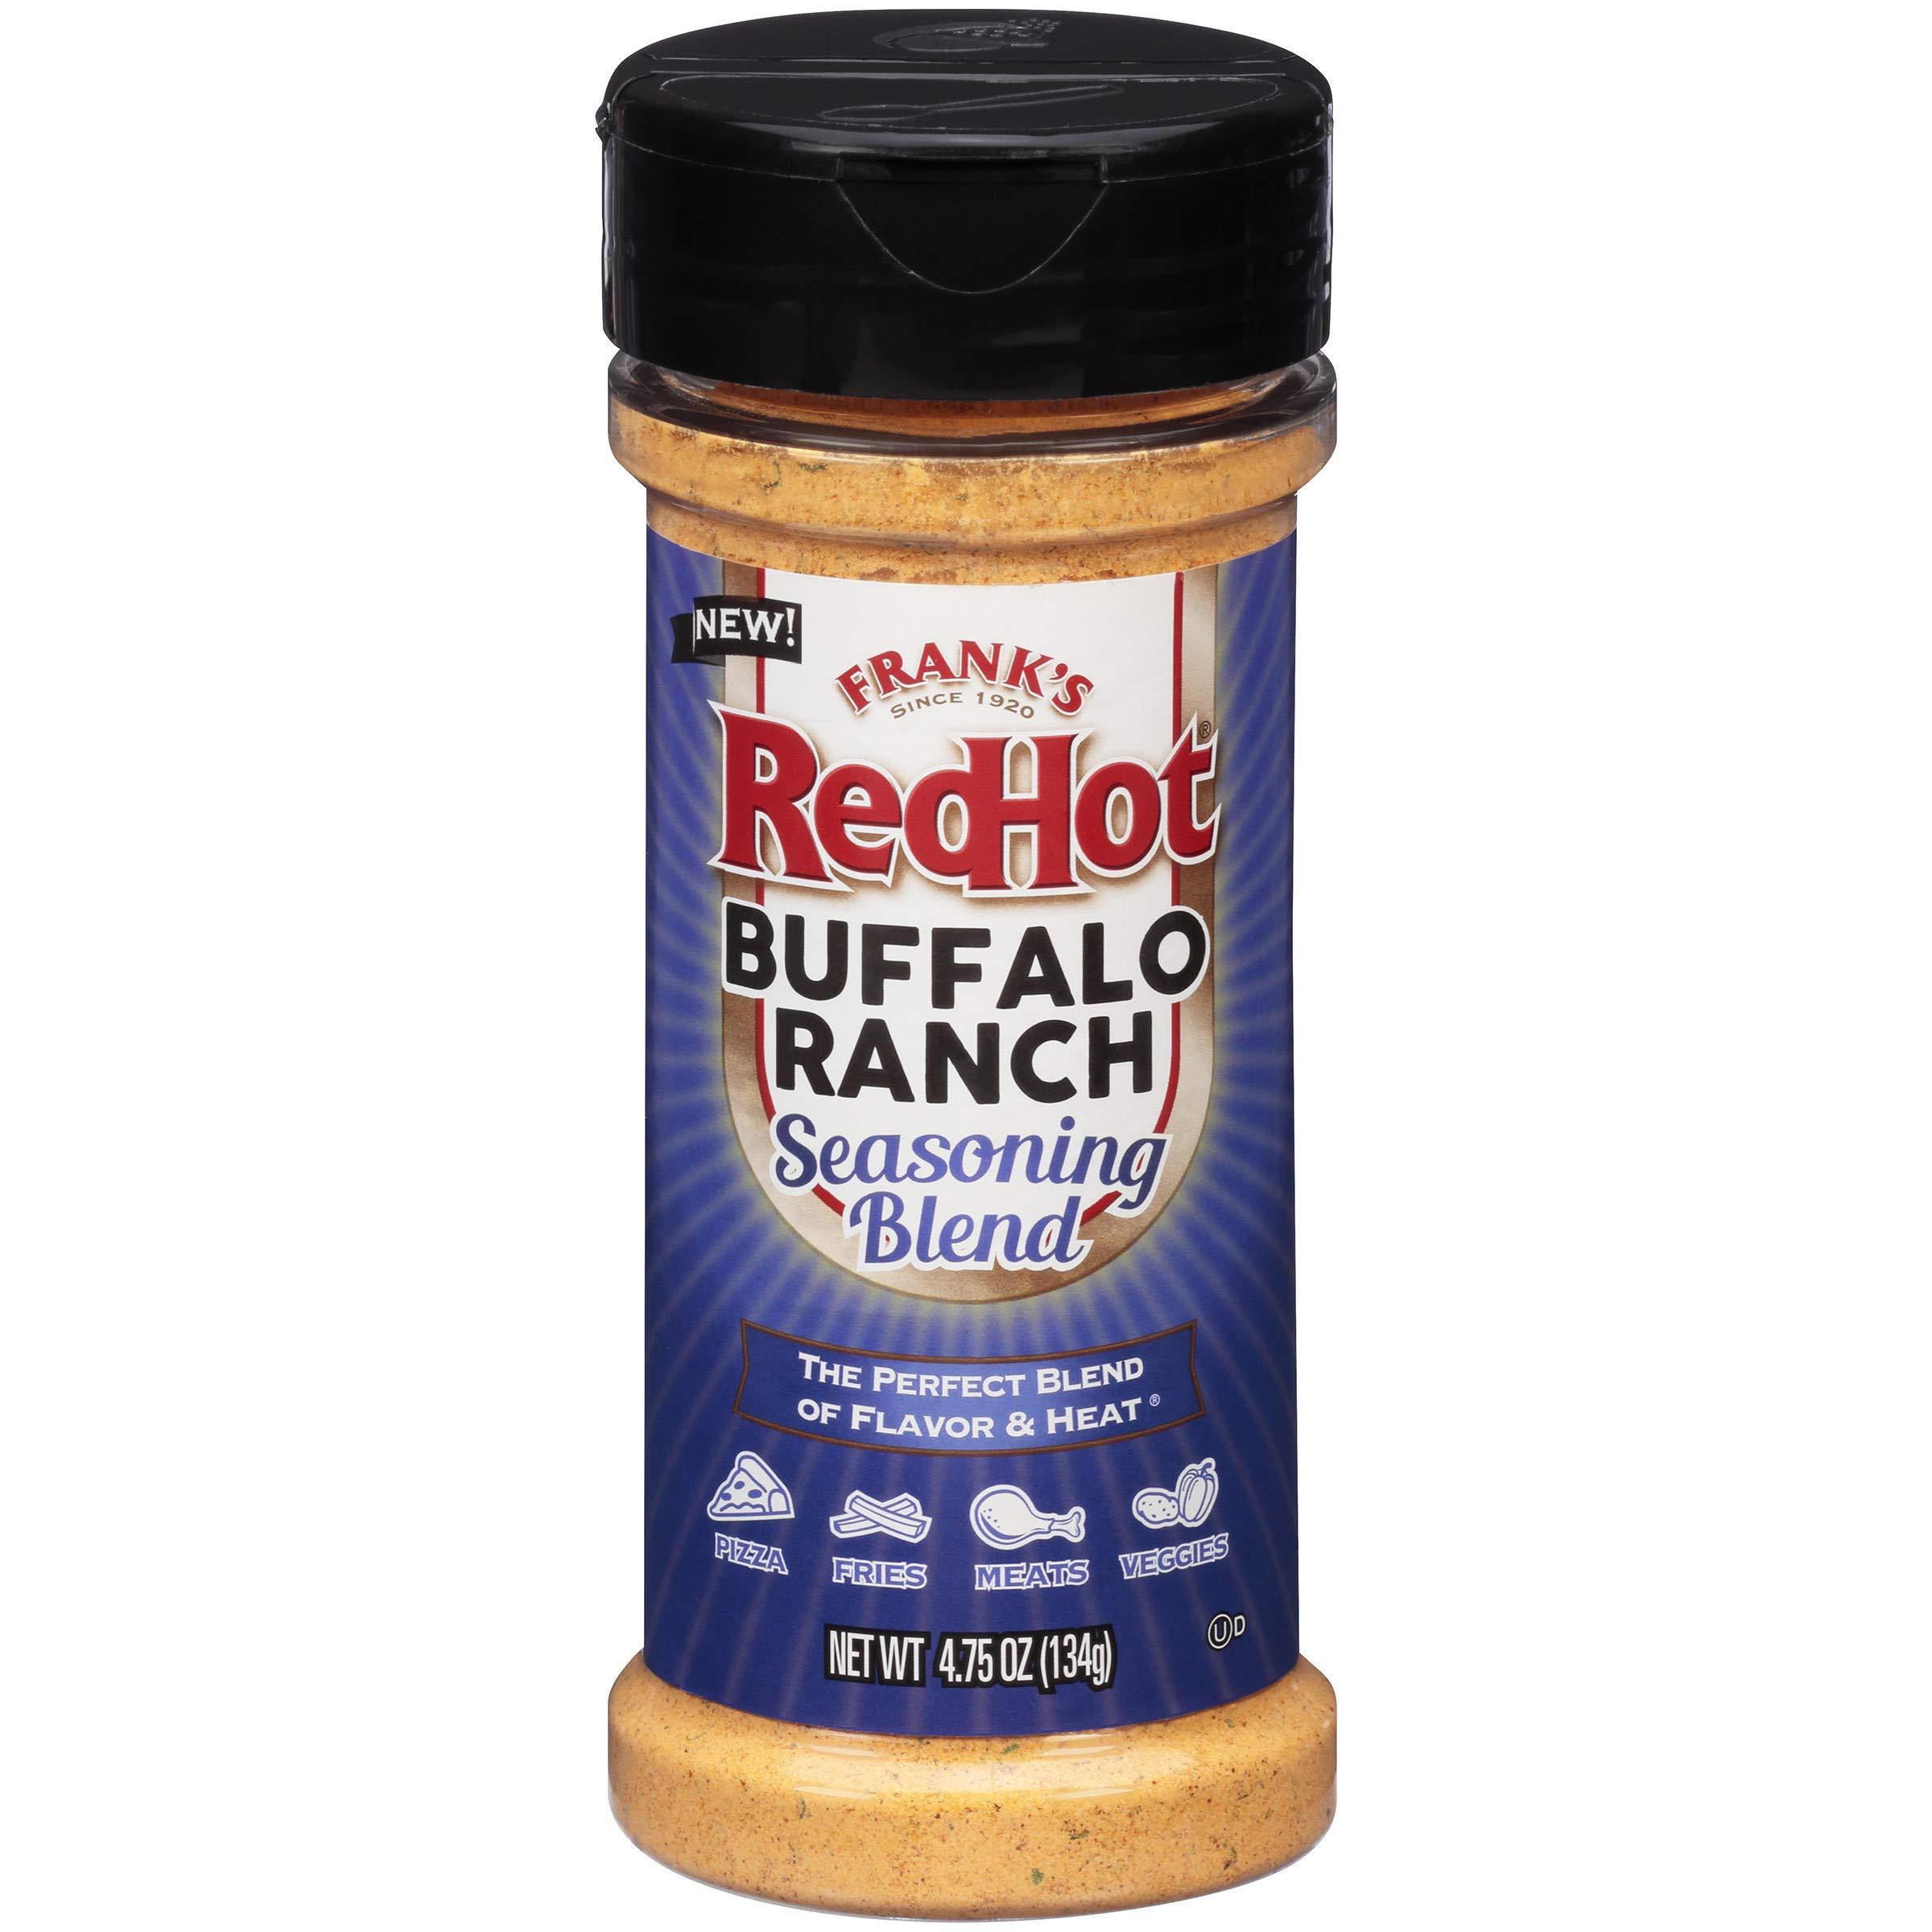 Frank's RedHot Buffalo Ranch Seasoning Blend, 4.75 oz